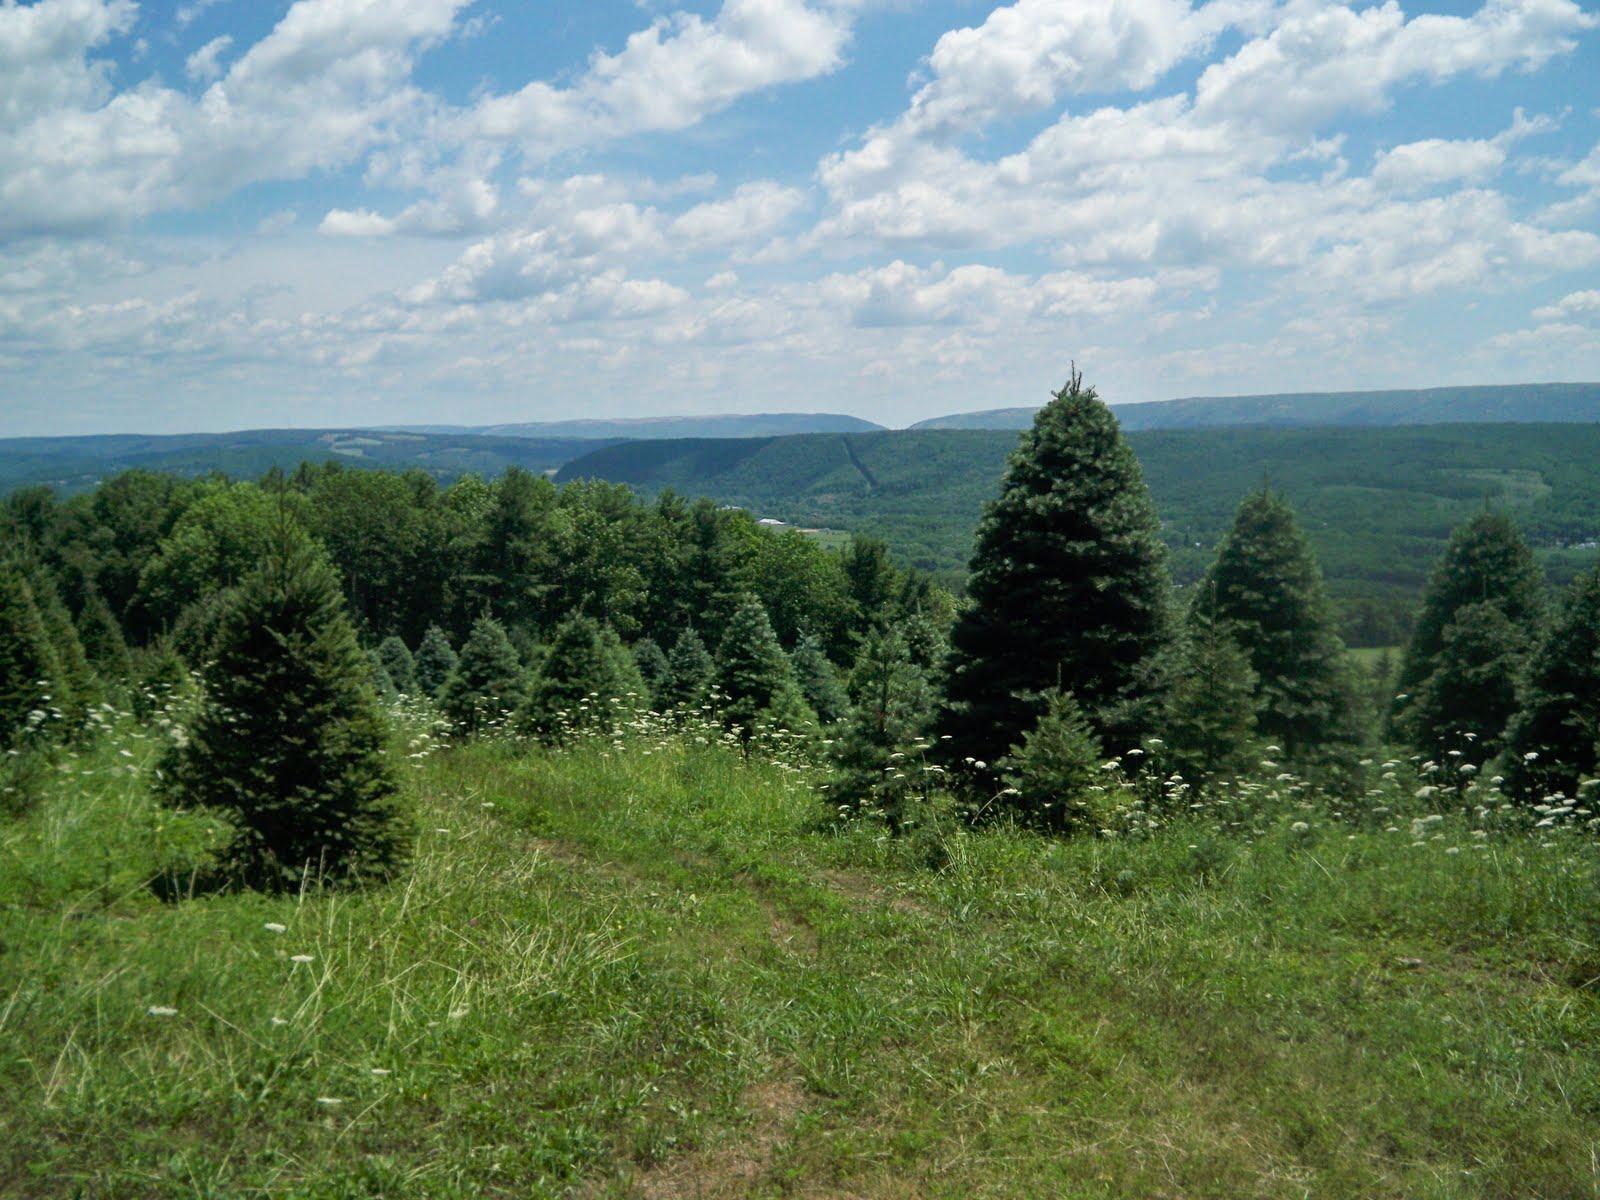 douglas fir lehigh gap in the distance from western field - Christmas Tree Hill